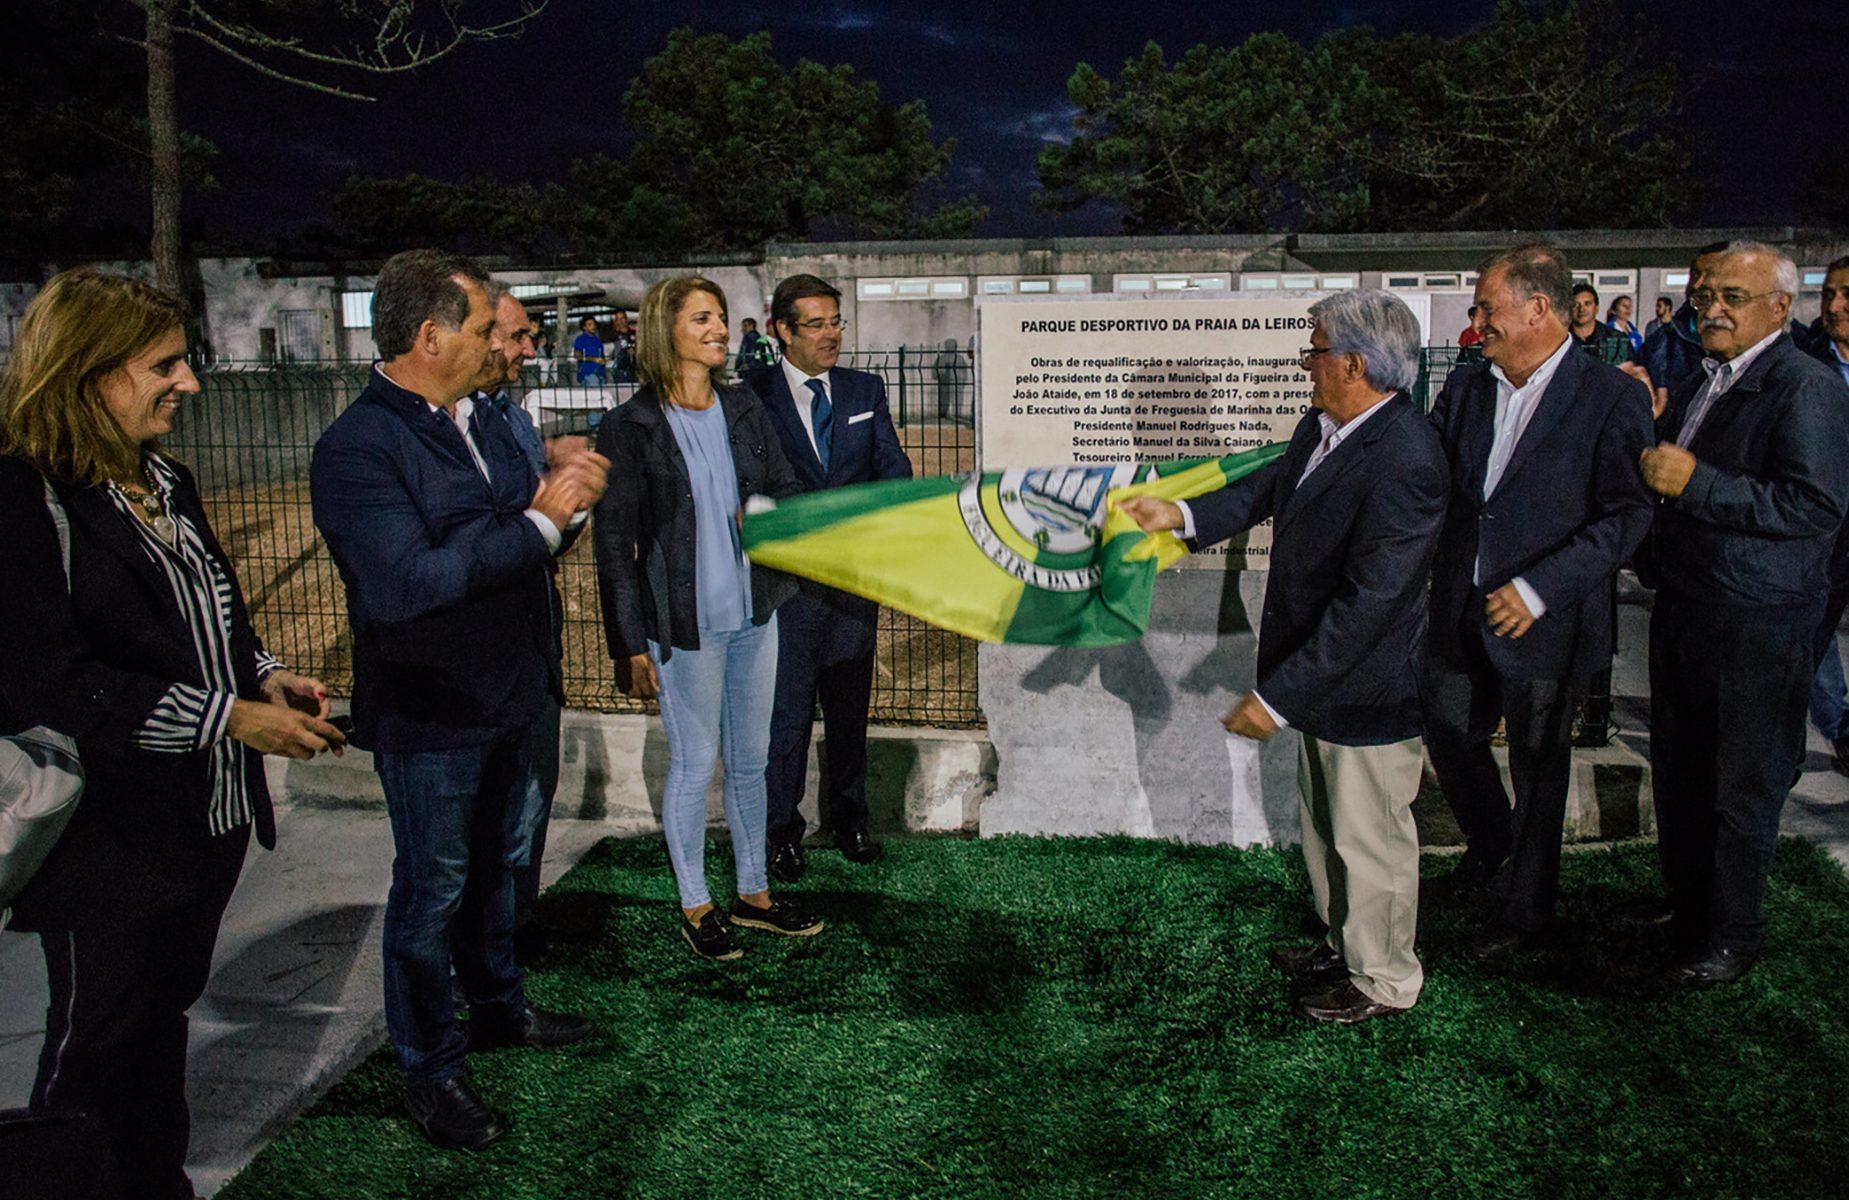 Inauguration of the sports complex of Praia da Leirosa